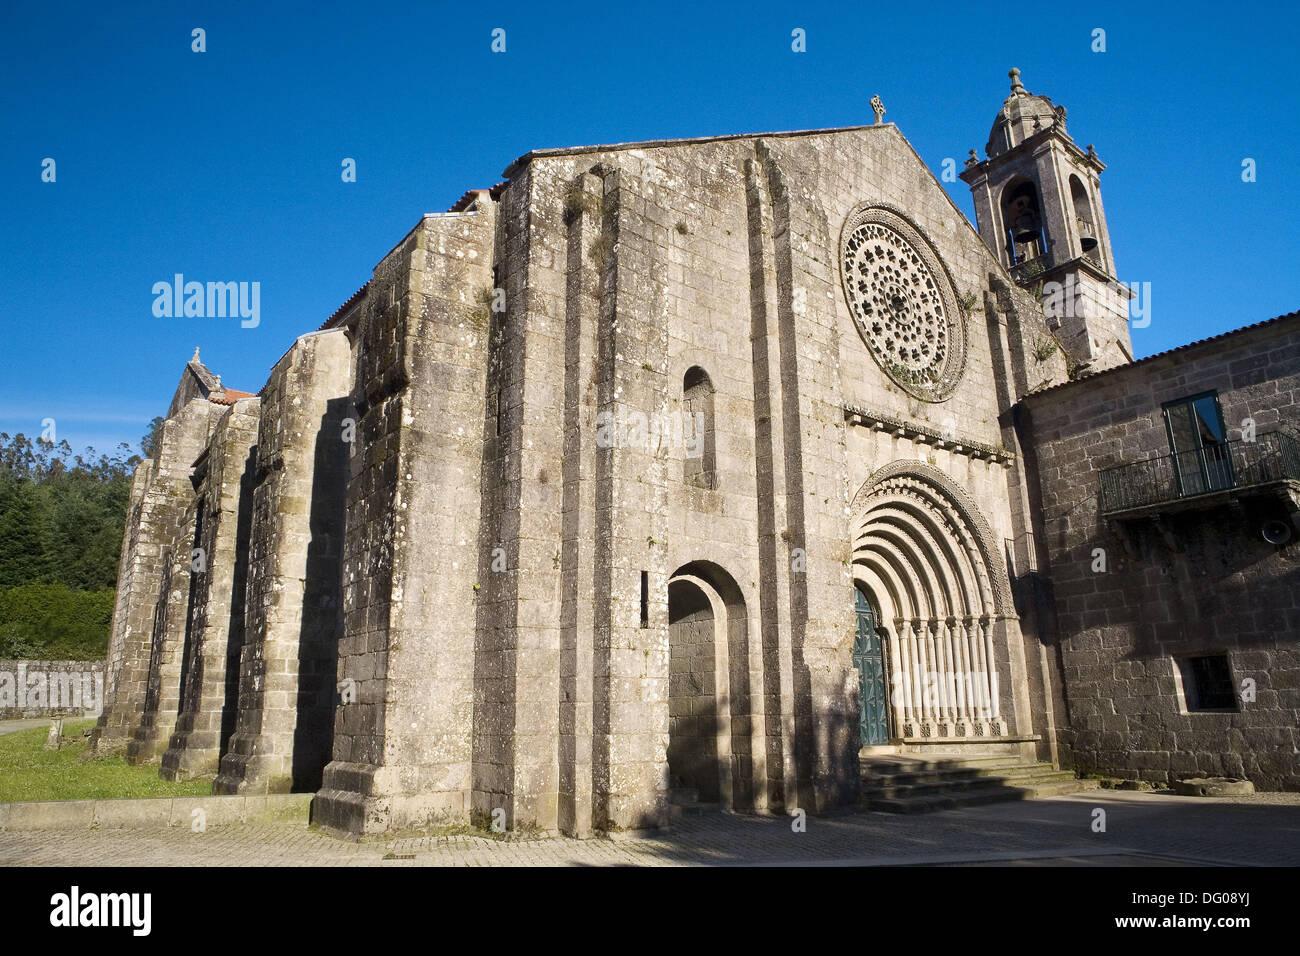 Meis Spain  city photos : ... Monastery of Armenteira. Meis, Pontevedra province, Galicia, Spain